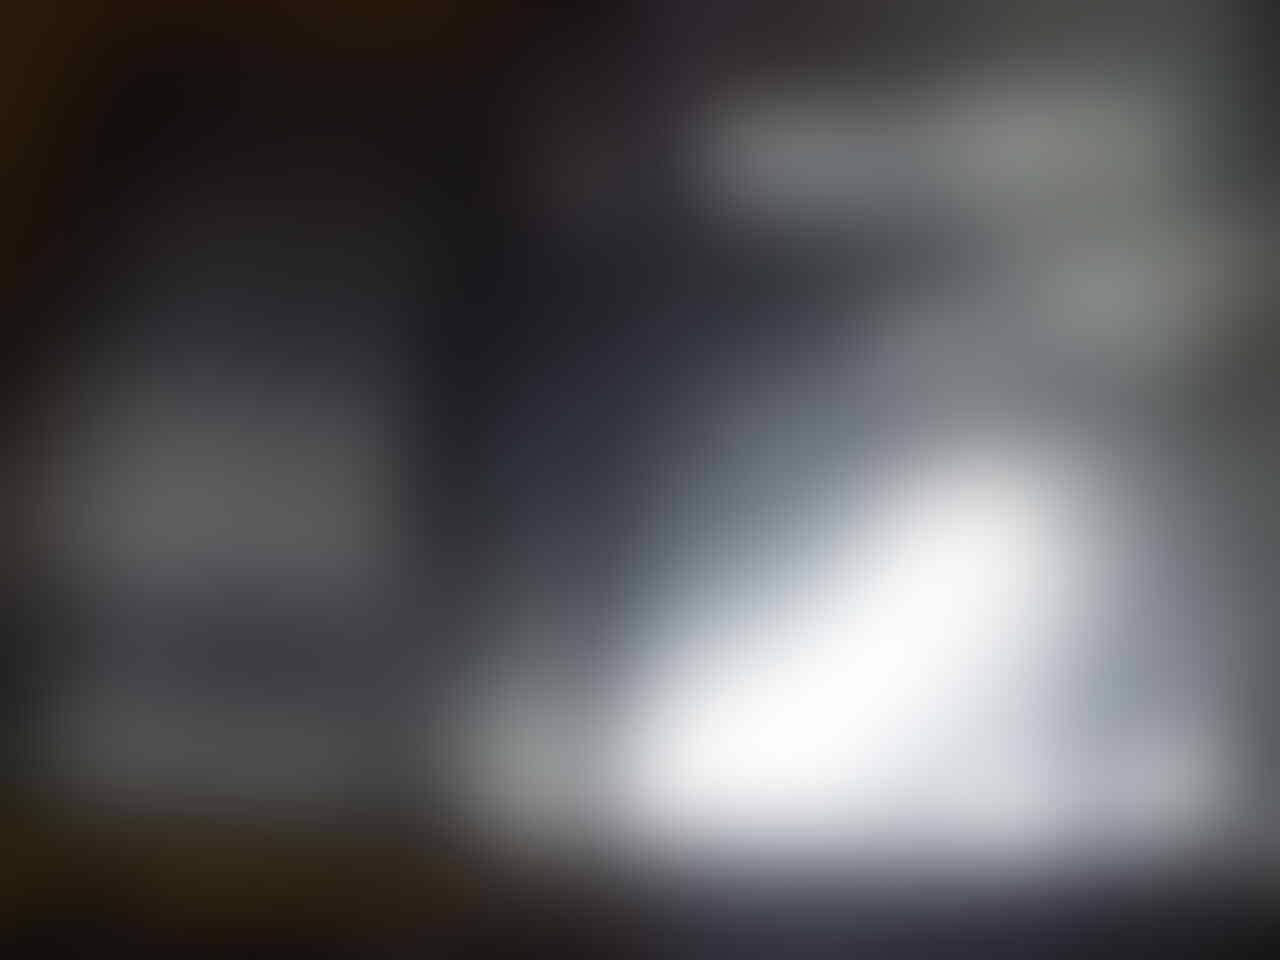 Game PC Ori Battlefield 4,COD : Ghost ,Football Manager 2014 (Bandung)